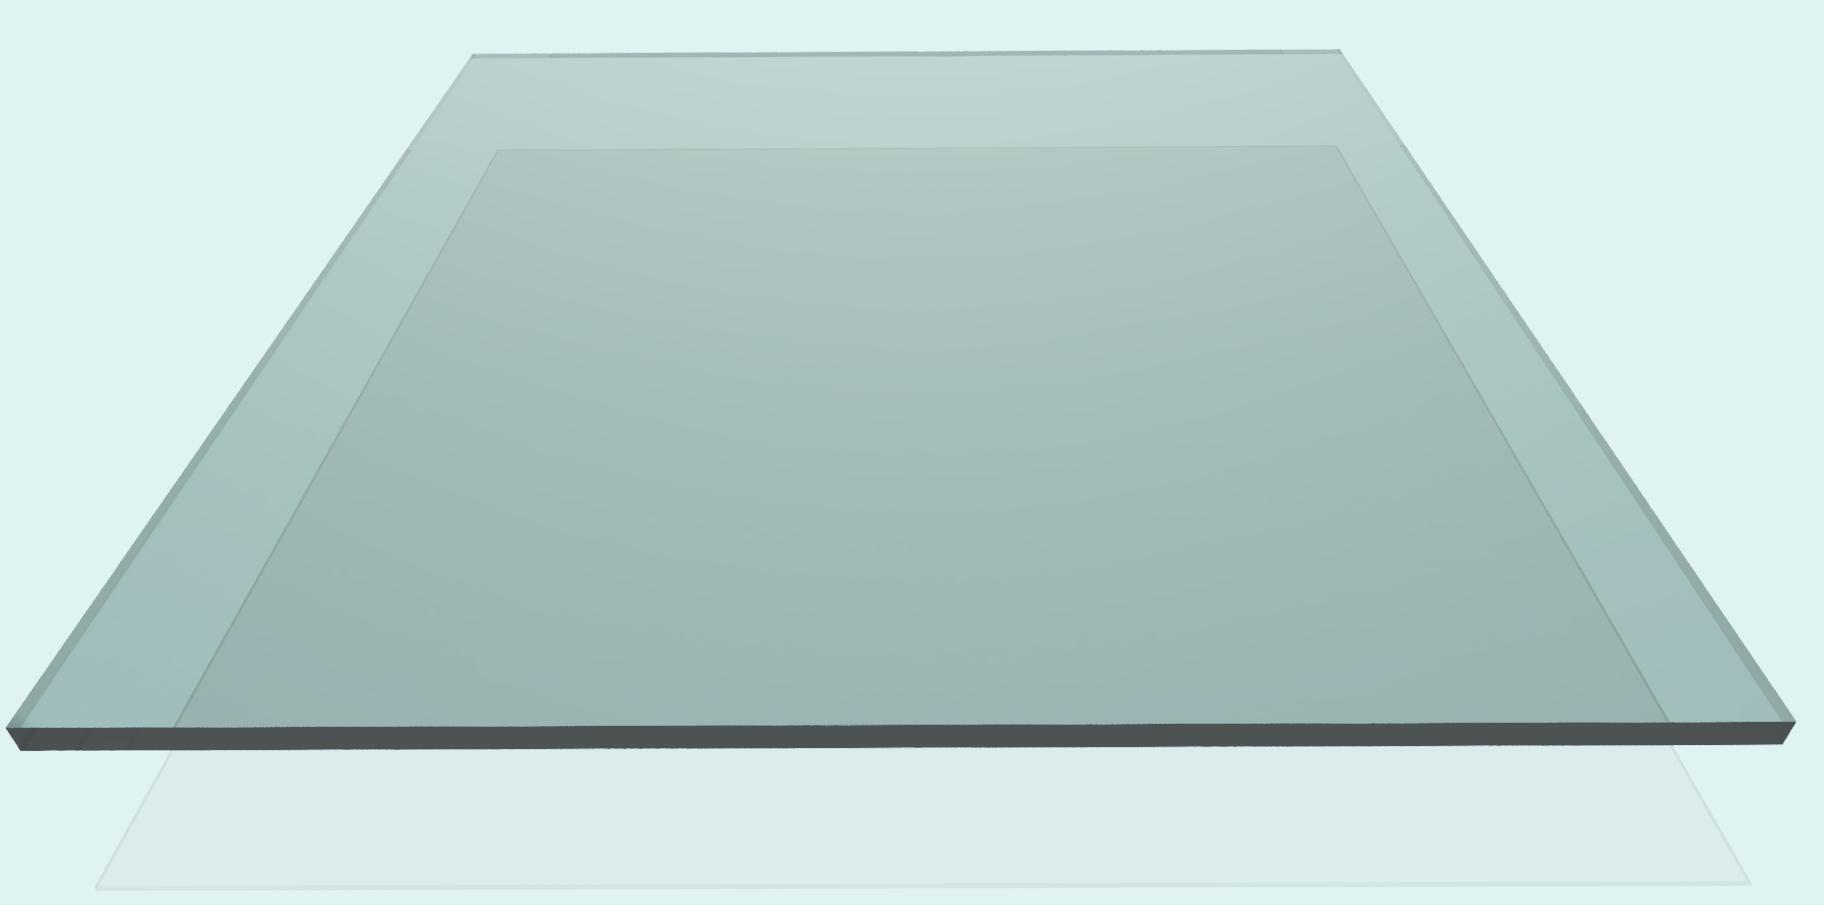 Polycarbonat 4 mm, klar